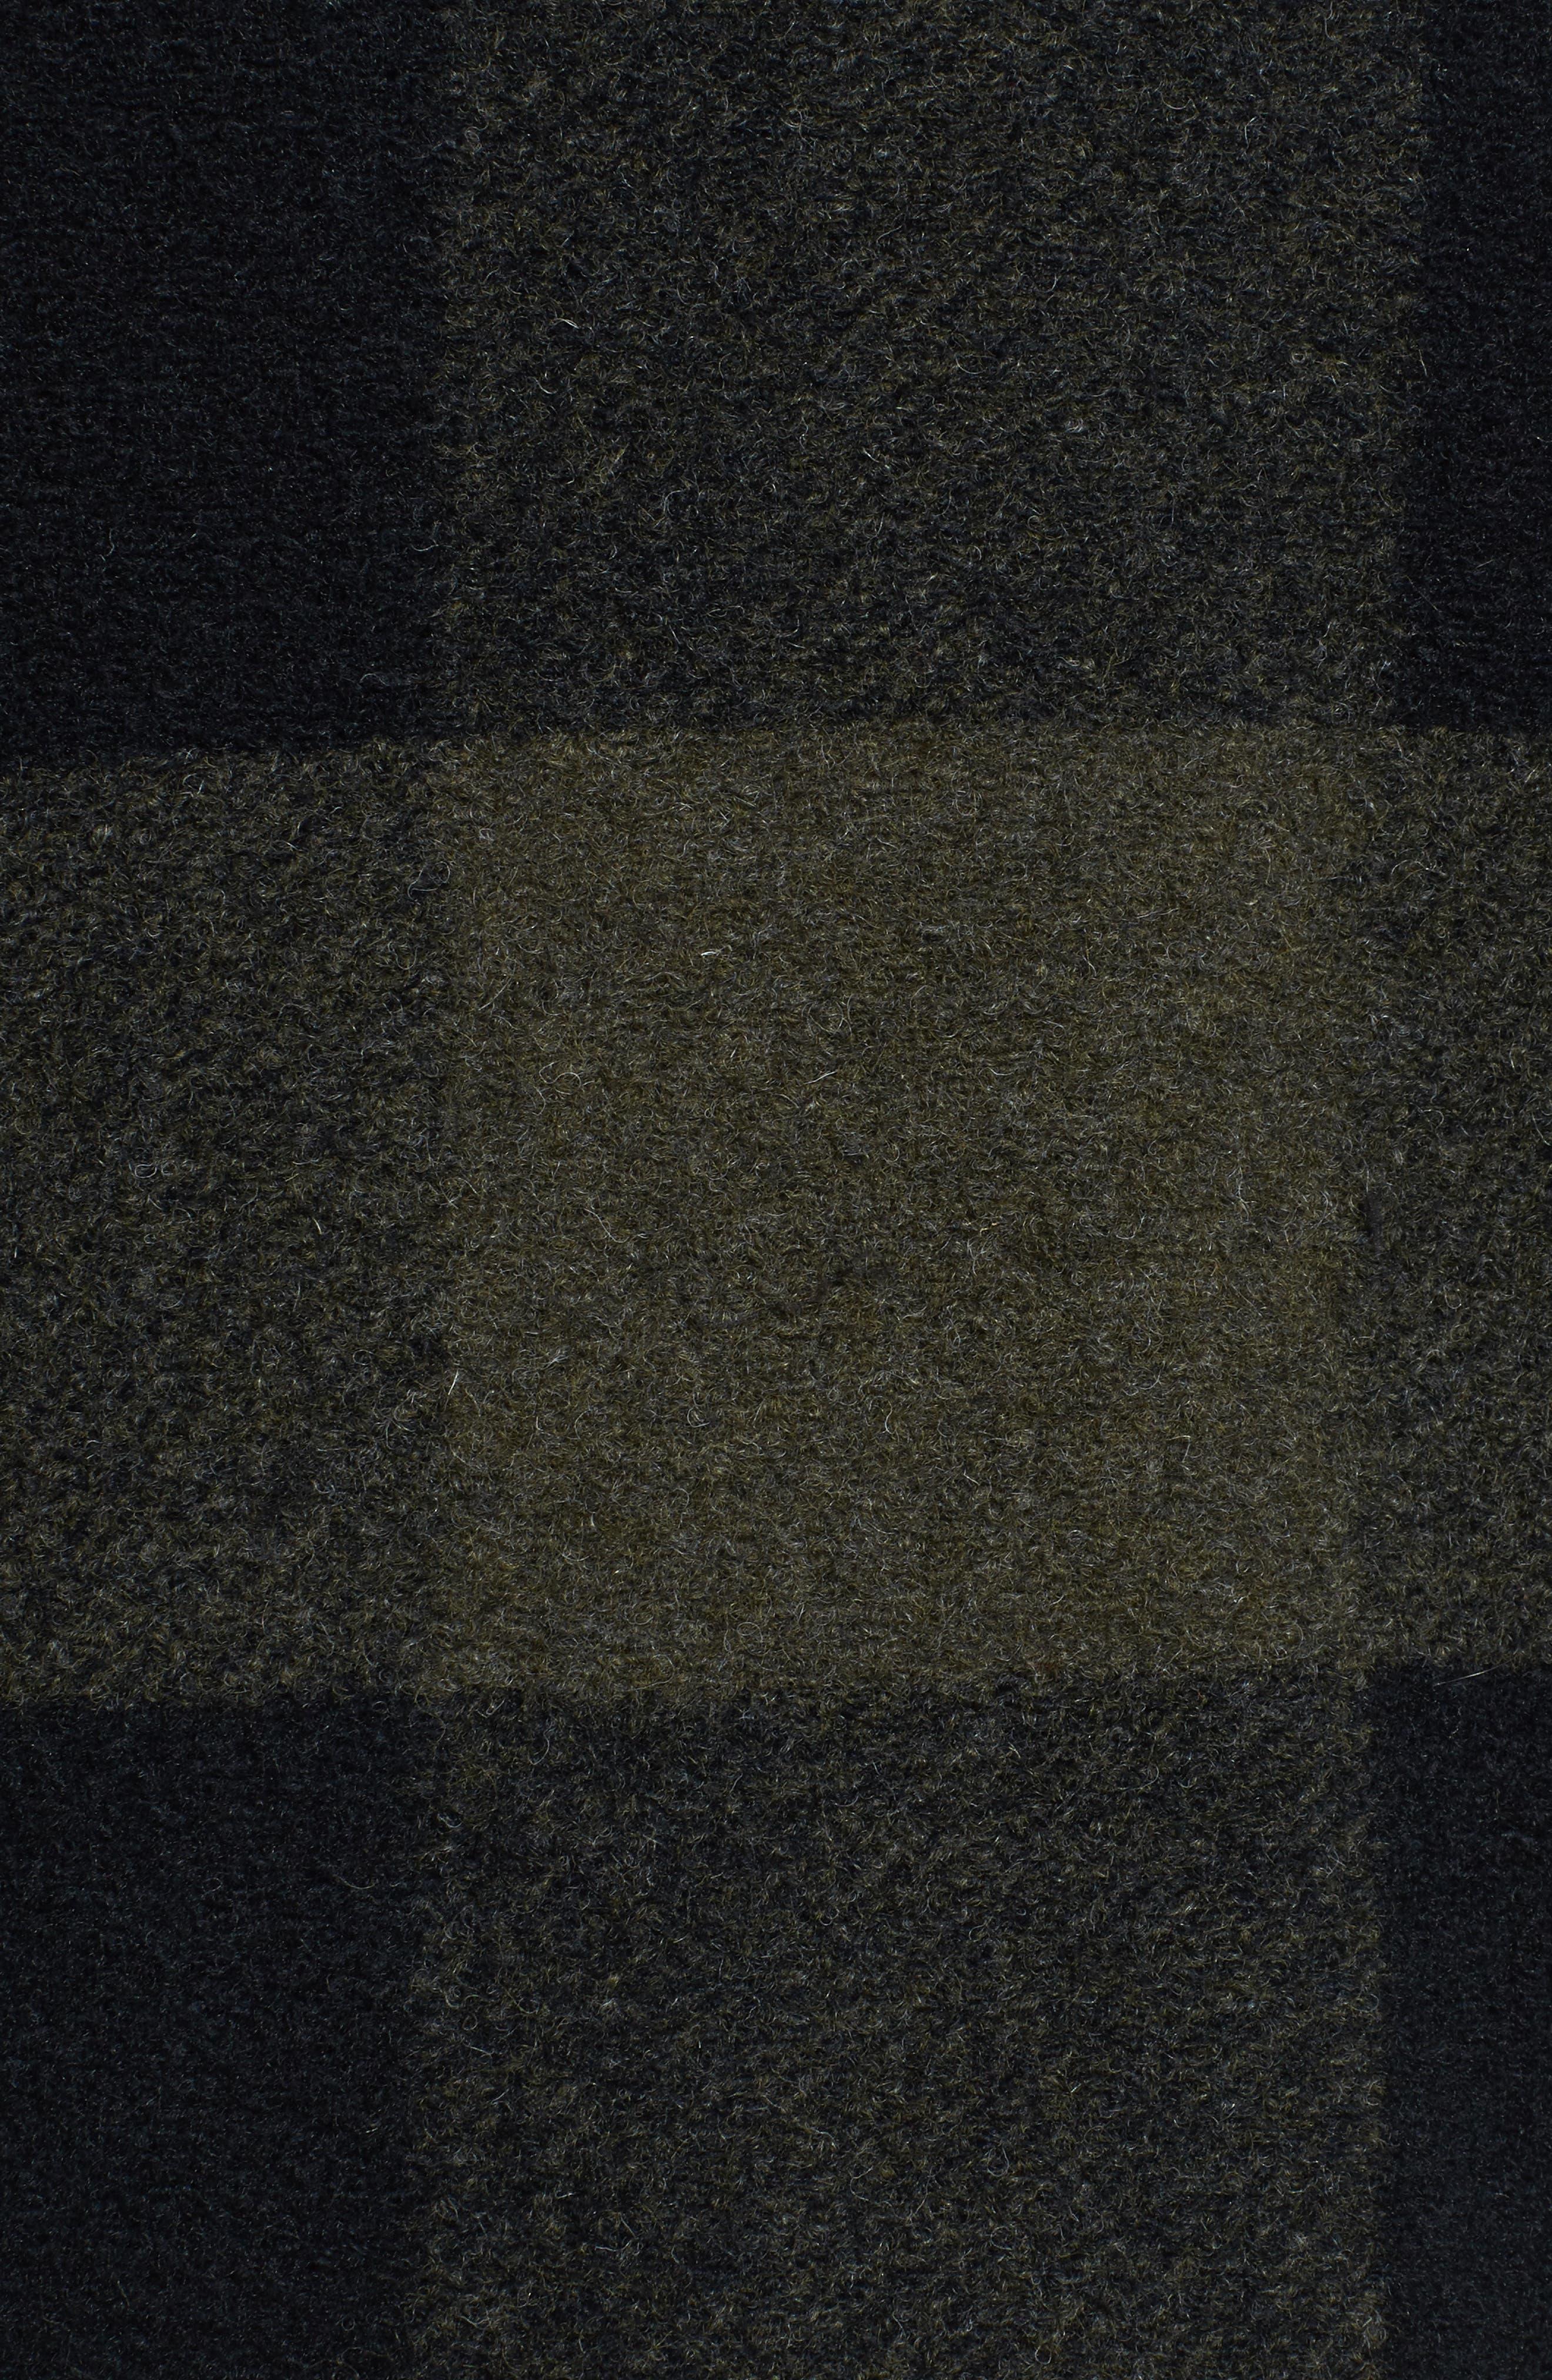 Paul Bunyan Plaid Wool Blend Barn Coat,                             Alternate thumbnail 6, color,                             342